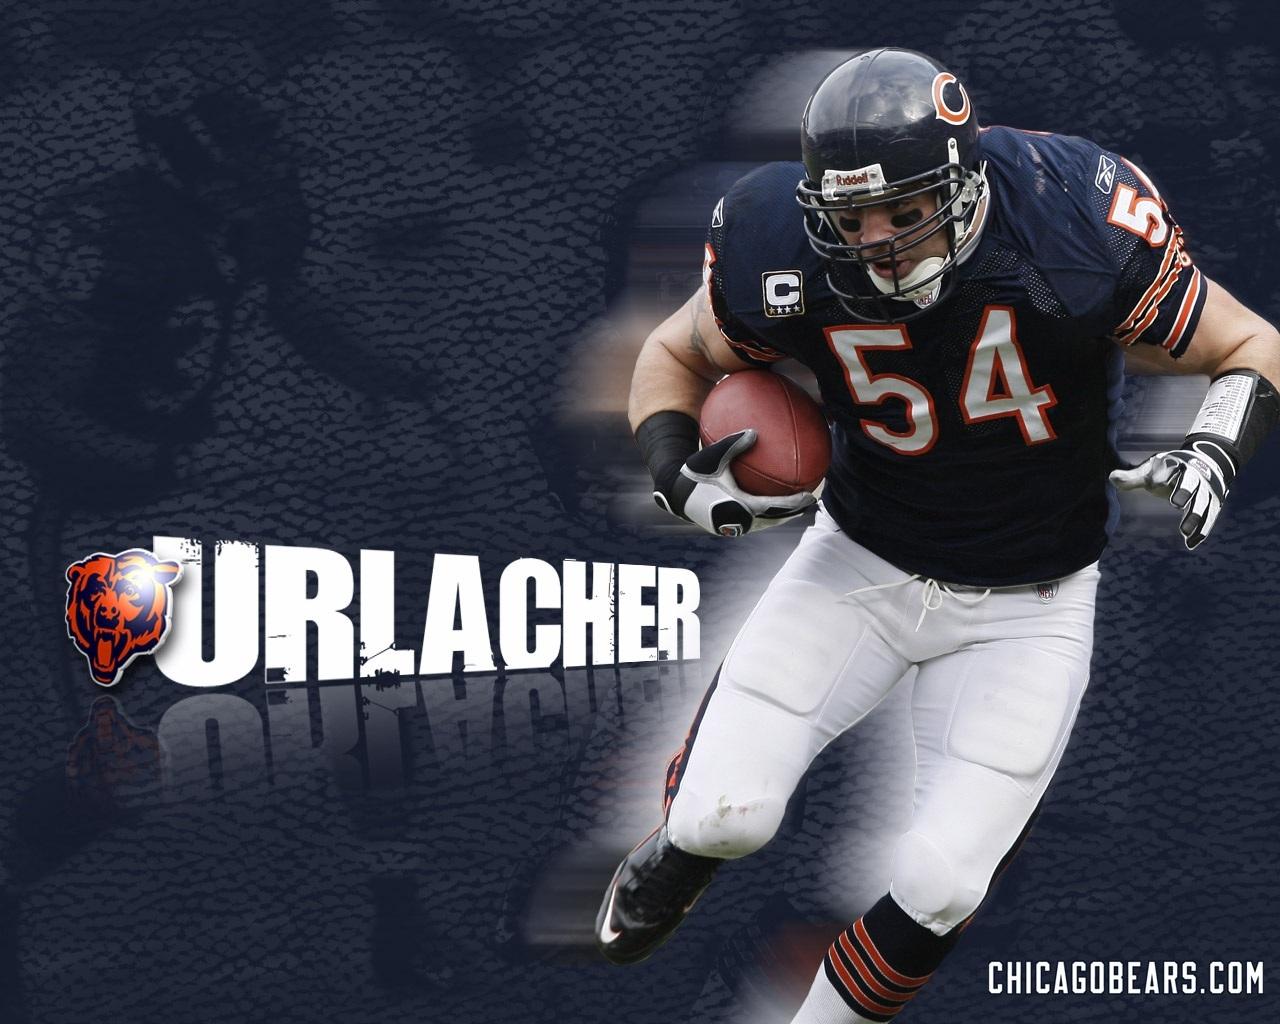 Brian Urlacher Football Normal Dorothea206 1280x1024